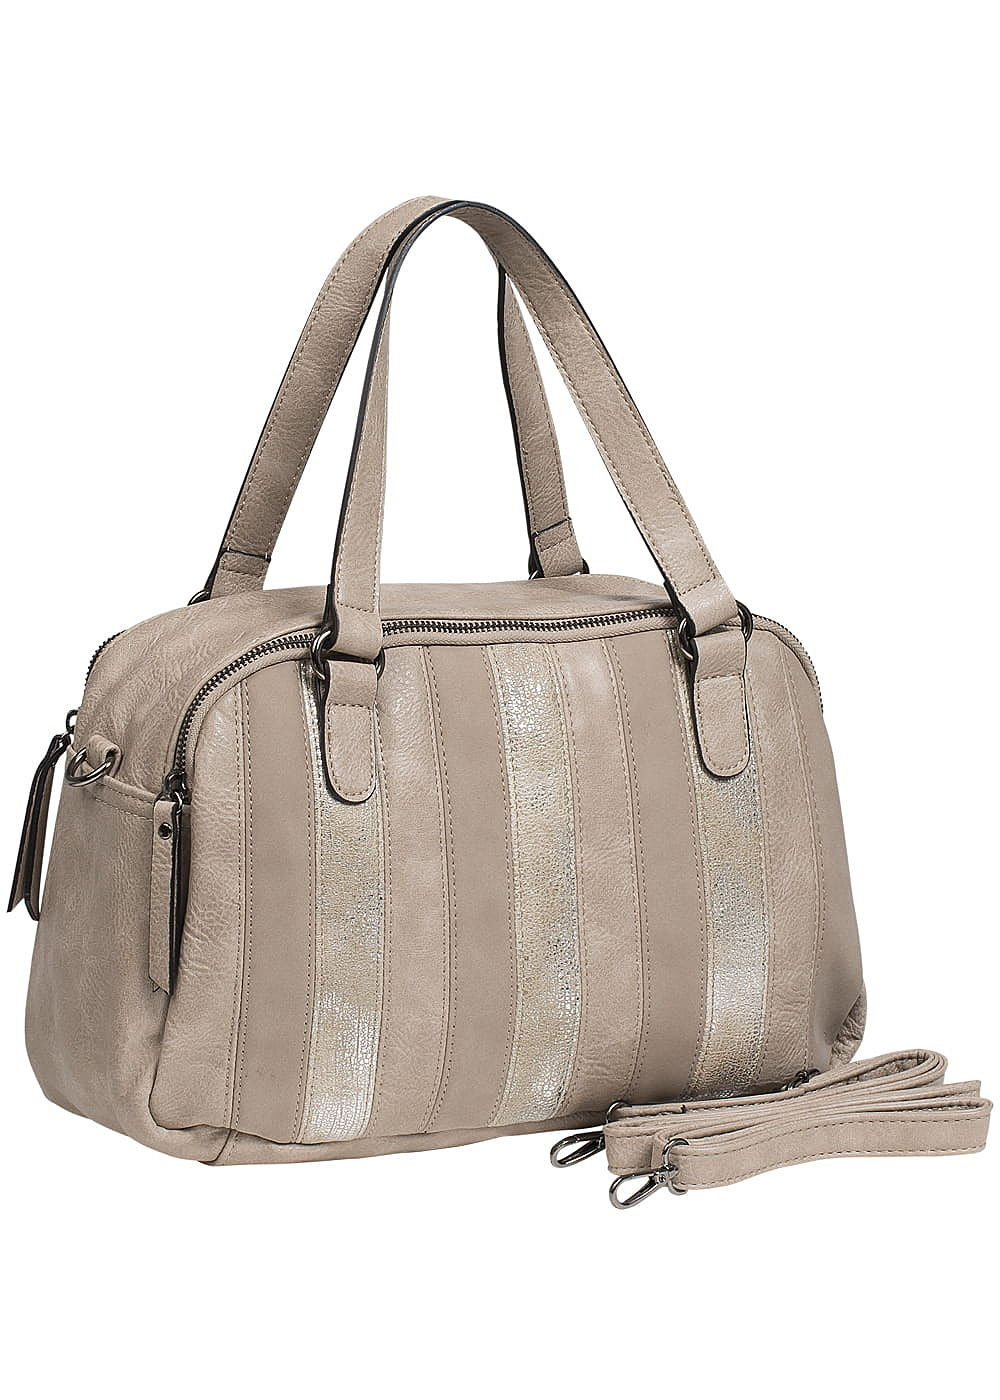 zabaione damen kunstleder handtasche 2 zip taschen beige hell gold 77onlineshop. Black Bedroom Furniture Sets. Home Design Ideas